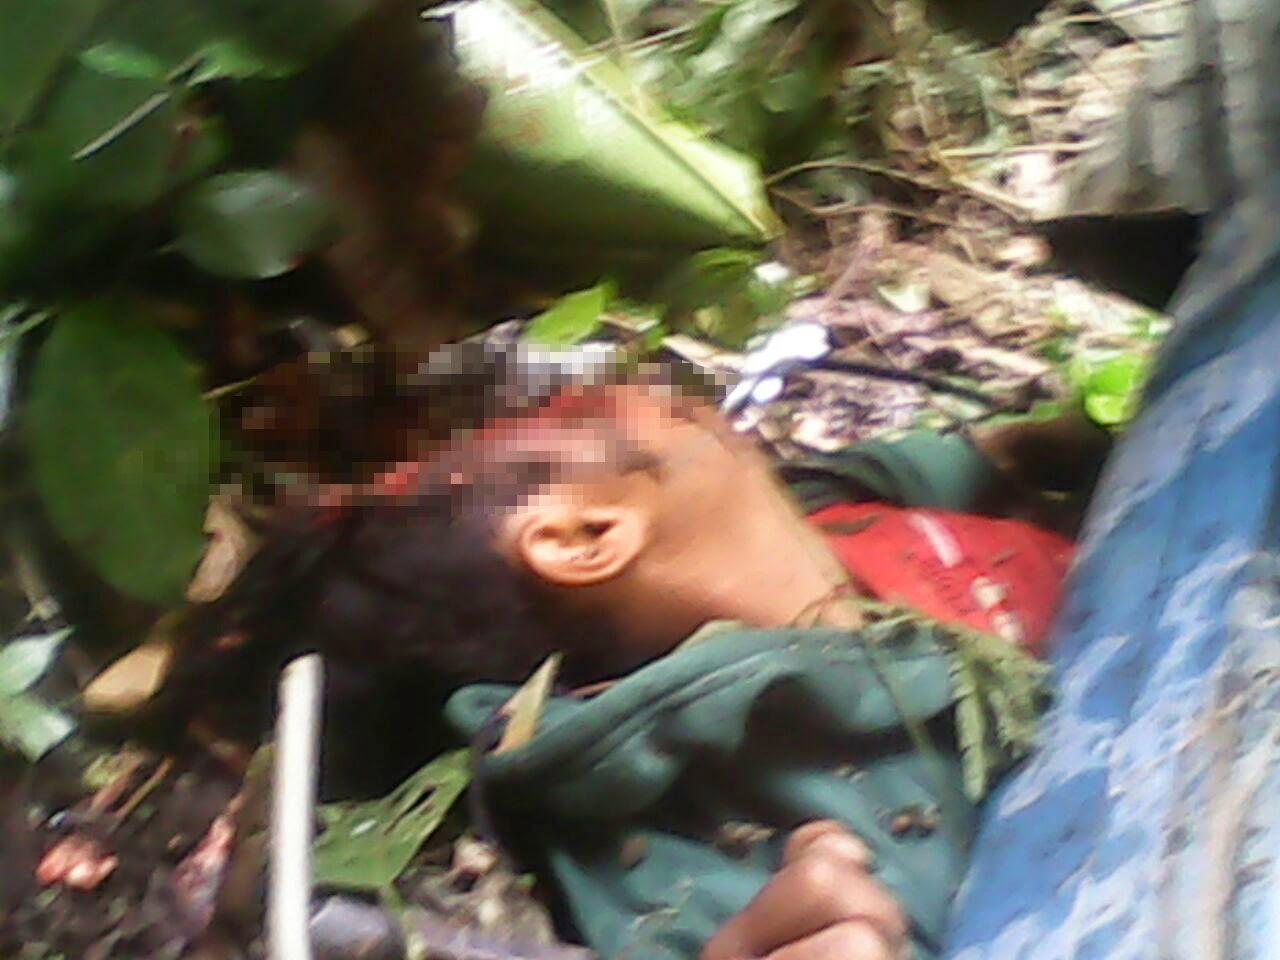 Accident in Pa Kakap muolliem